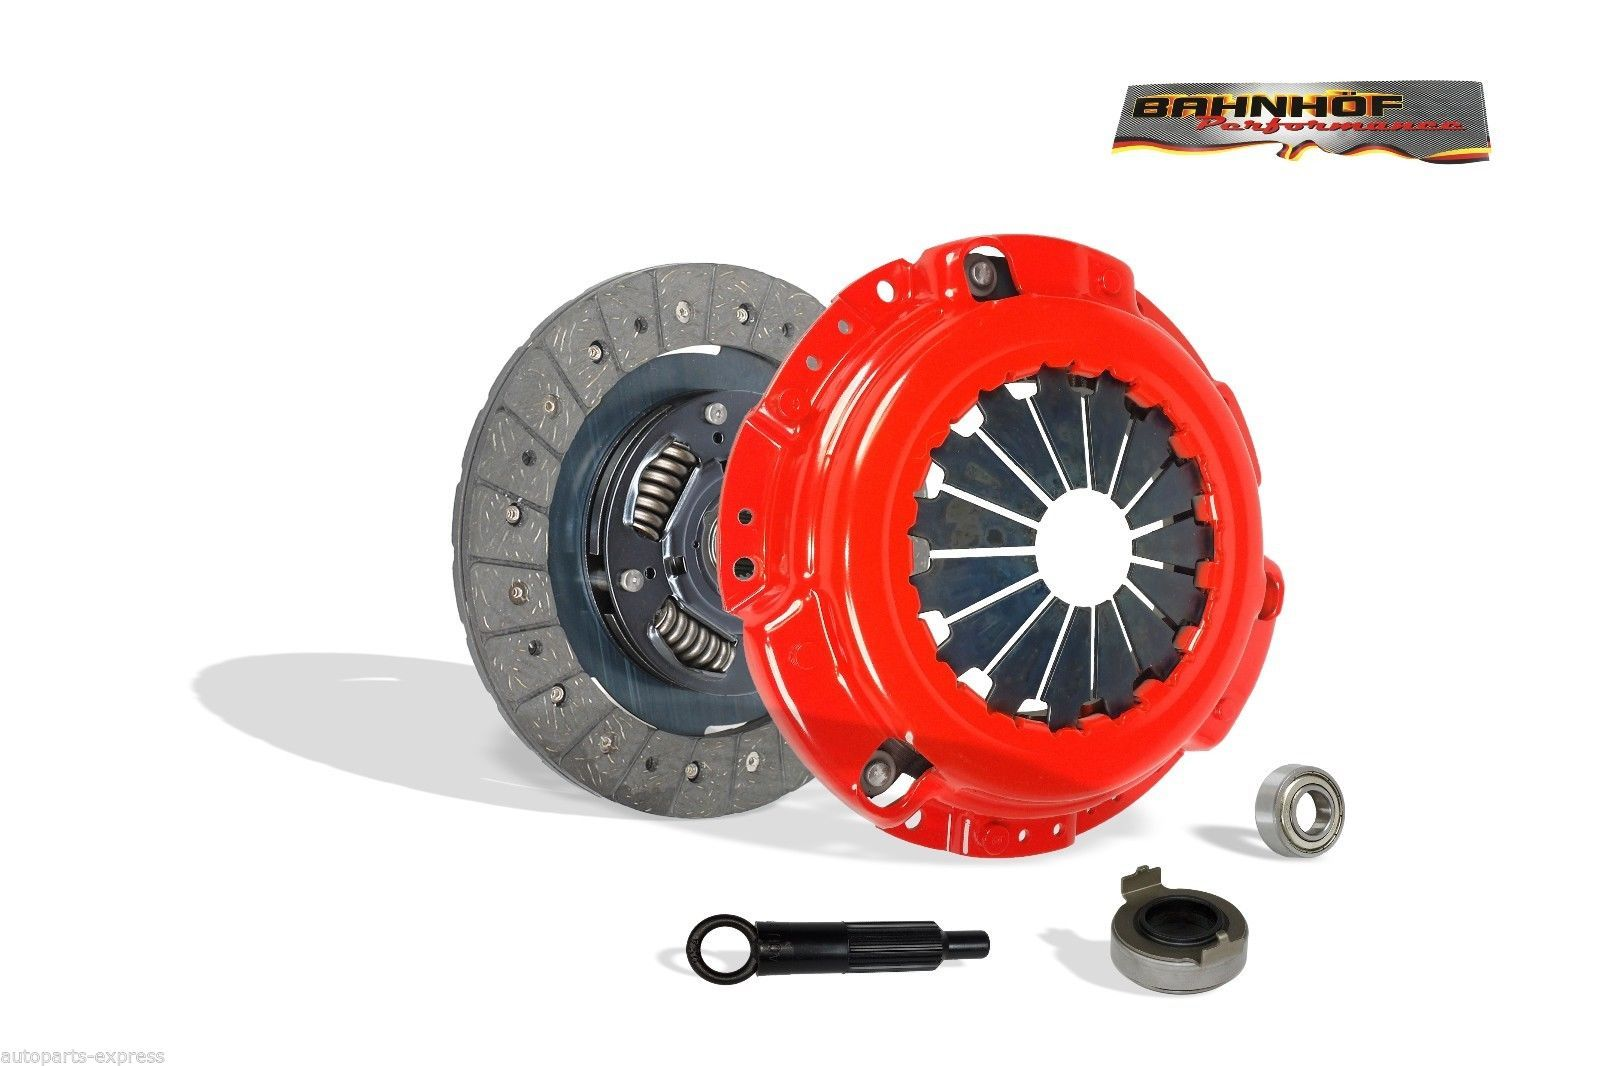 medium resolution of clutch kit racing hd bahnhof for 90 03 honda accord prelude acura cl f22 f23